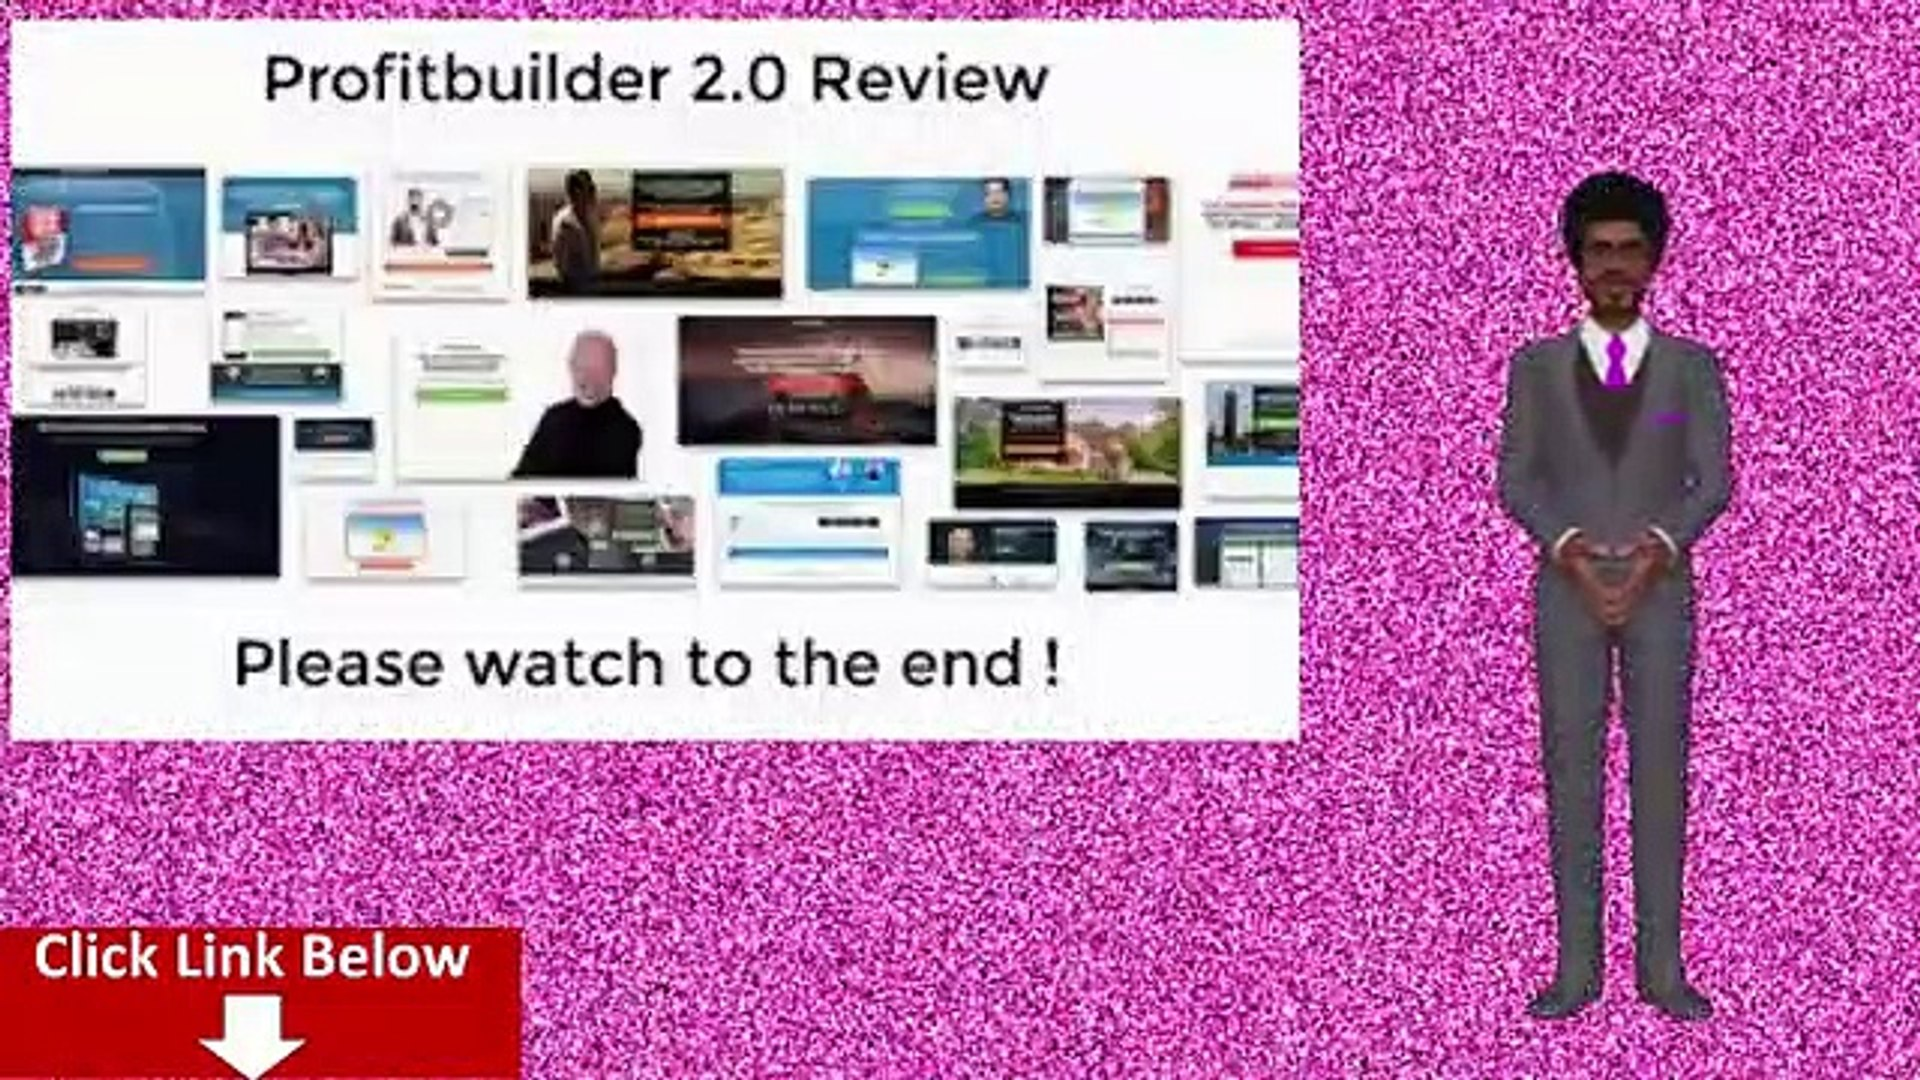 Profit Builder 2.0 Reviews-IMSC Profit Builder 2.0 Bonus-How To Create High Converting Landing Pages